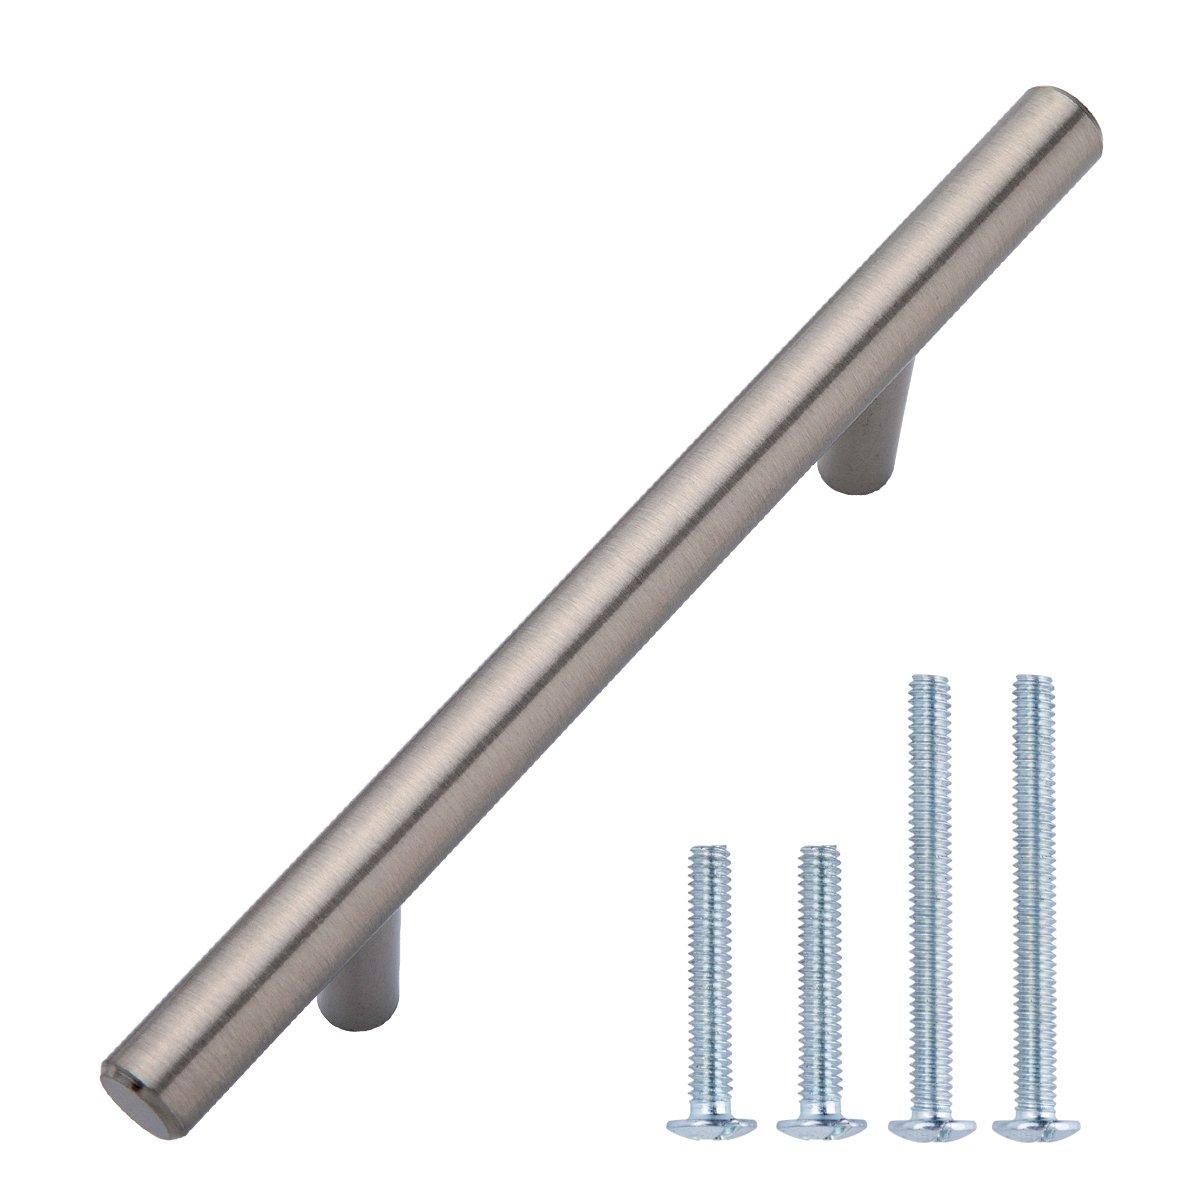 AmazonBasics Euro Bar Cabinet Handle 3 8 Diameter 5.38 Length 3 Hole Center Satin Nickel 10 Pack